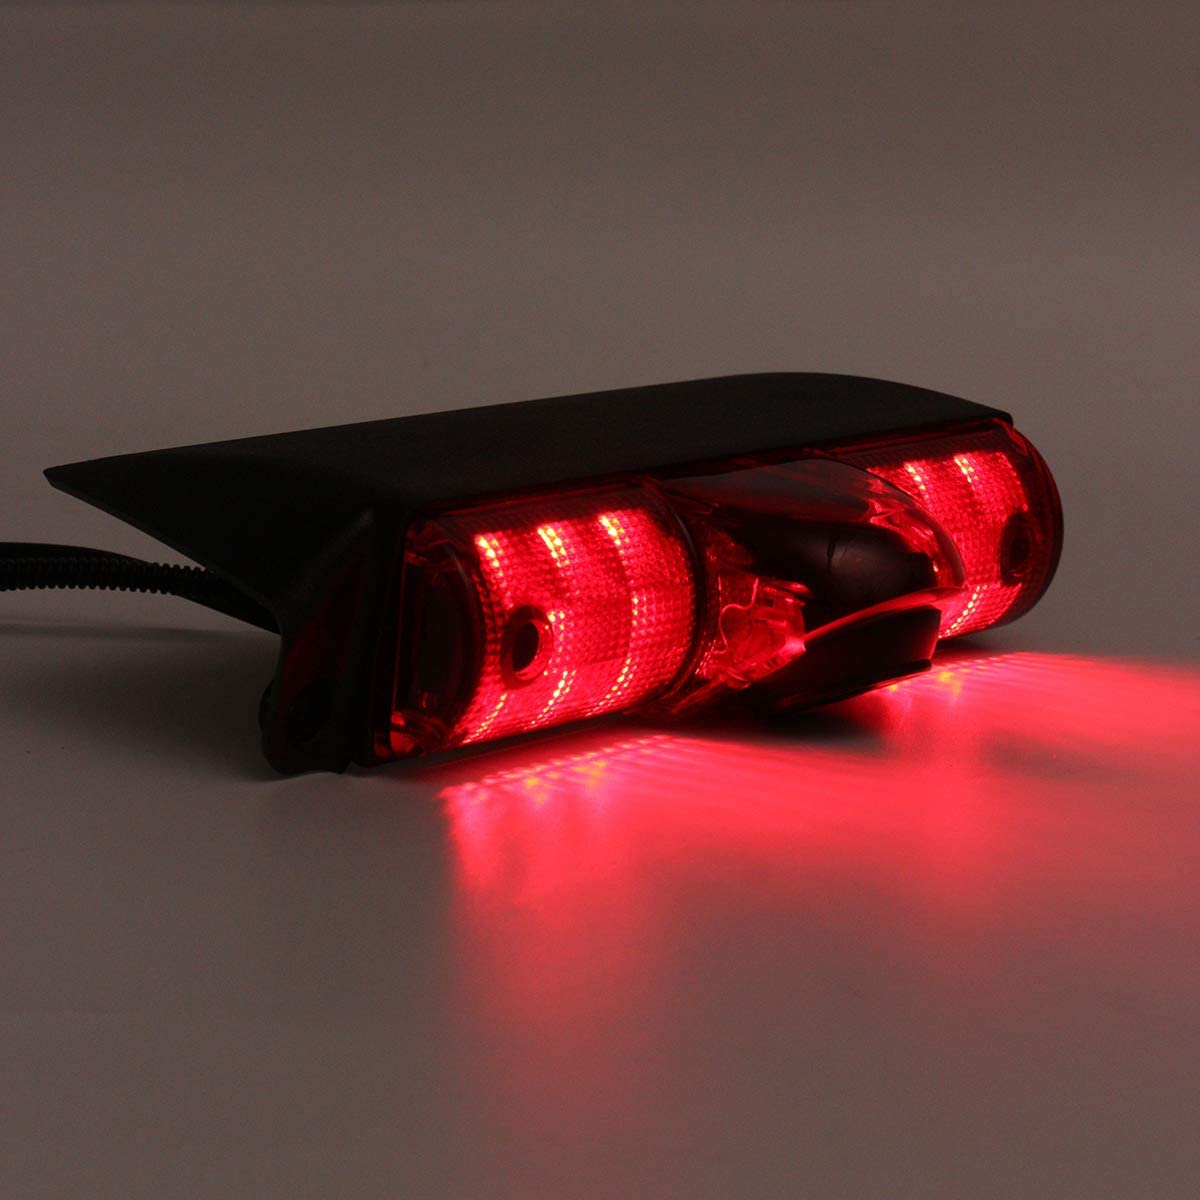 TUXIN-DIRECT Night Vision 3rd Brake Light Reversing Backup Camera 4.3 inch TFT Monitor Display for GMC Savana Chevrolet Explorer Chevy Express 1500 2500 3500 Van 2003-2018